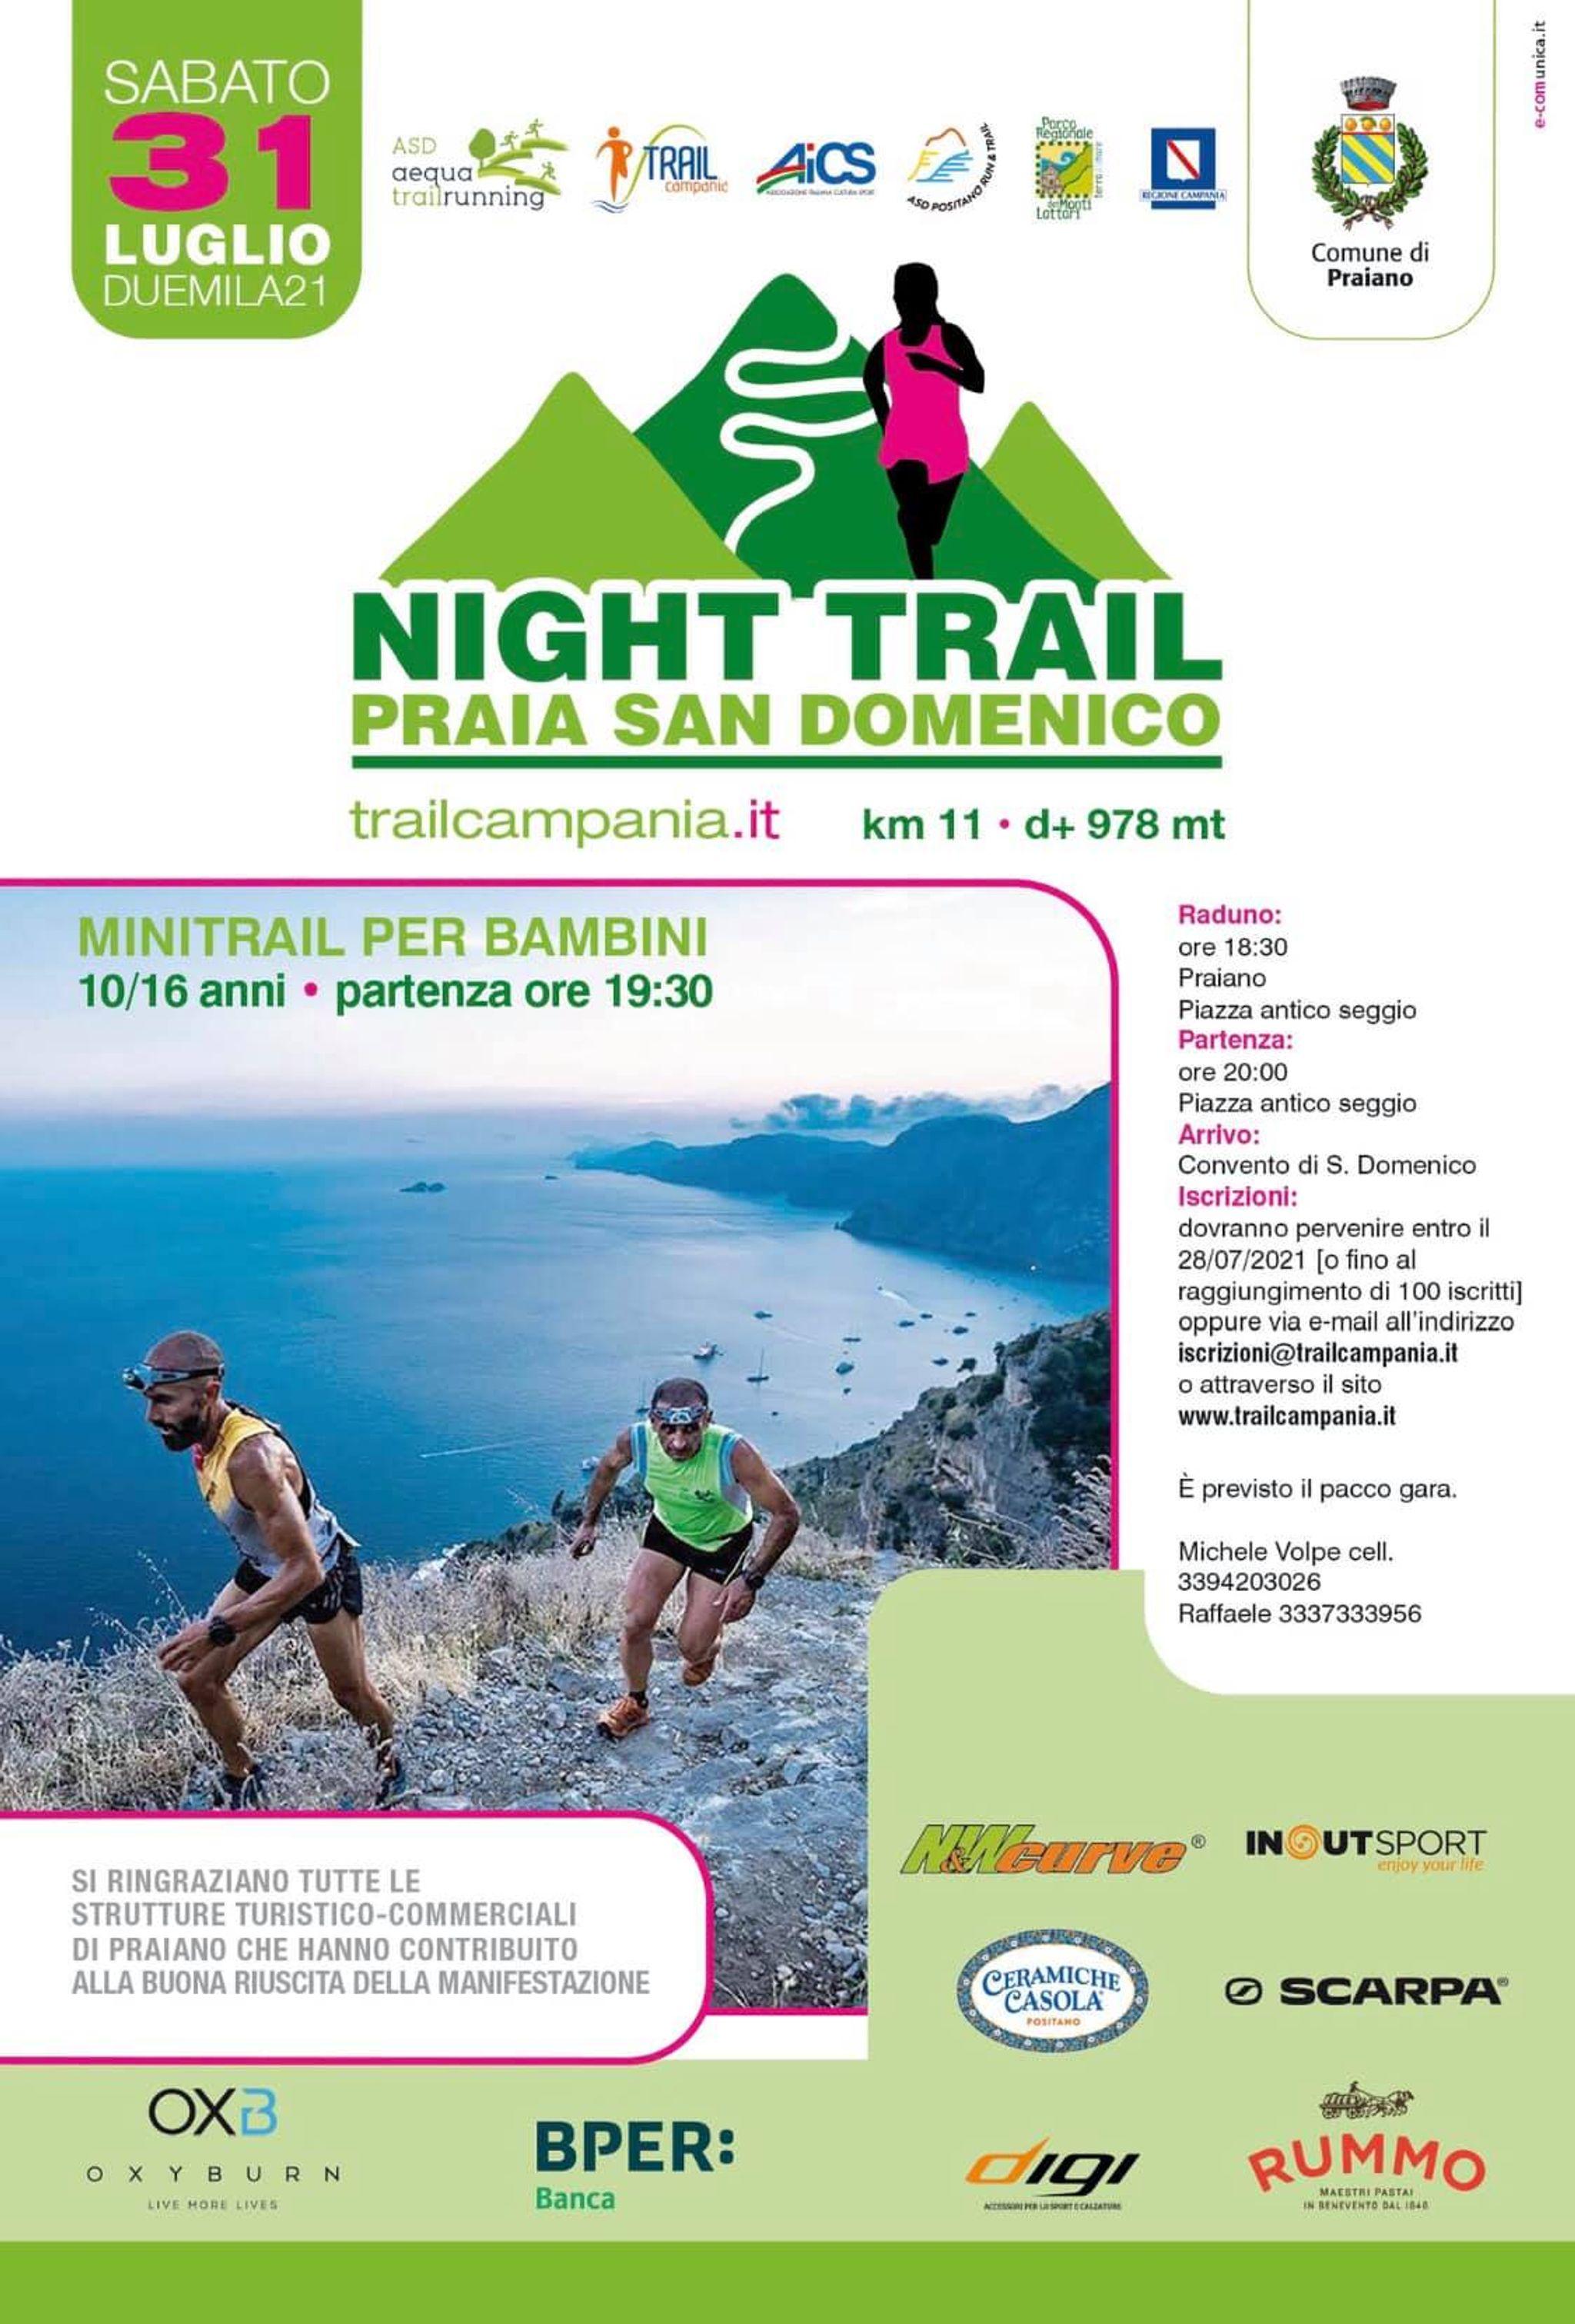 Night Trail Praia San Domenico